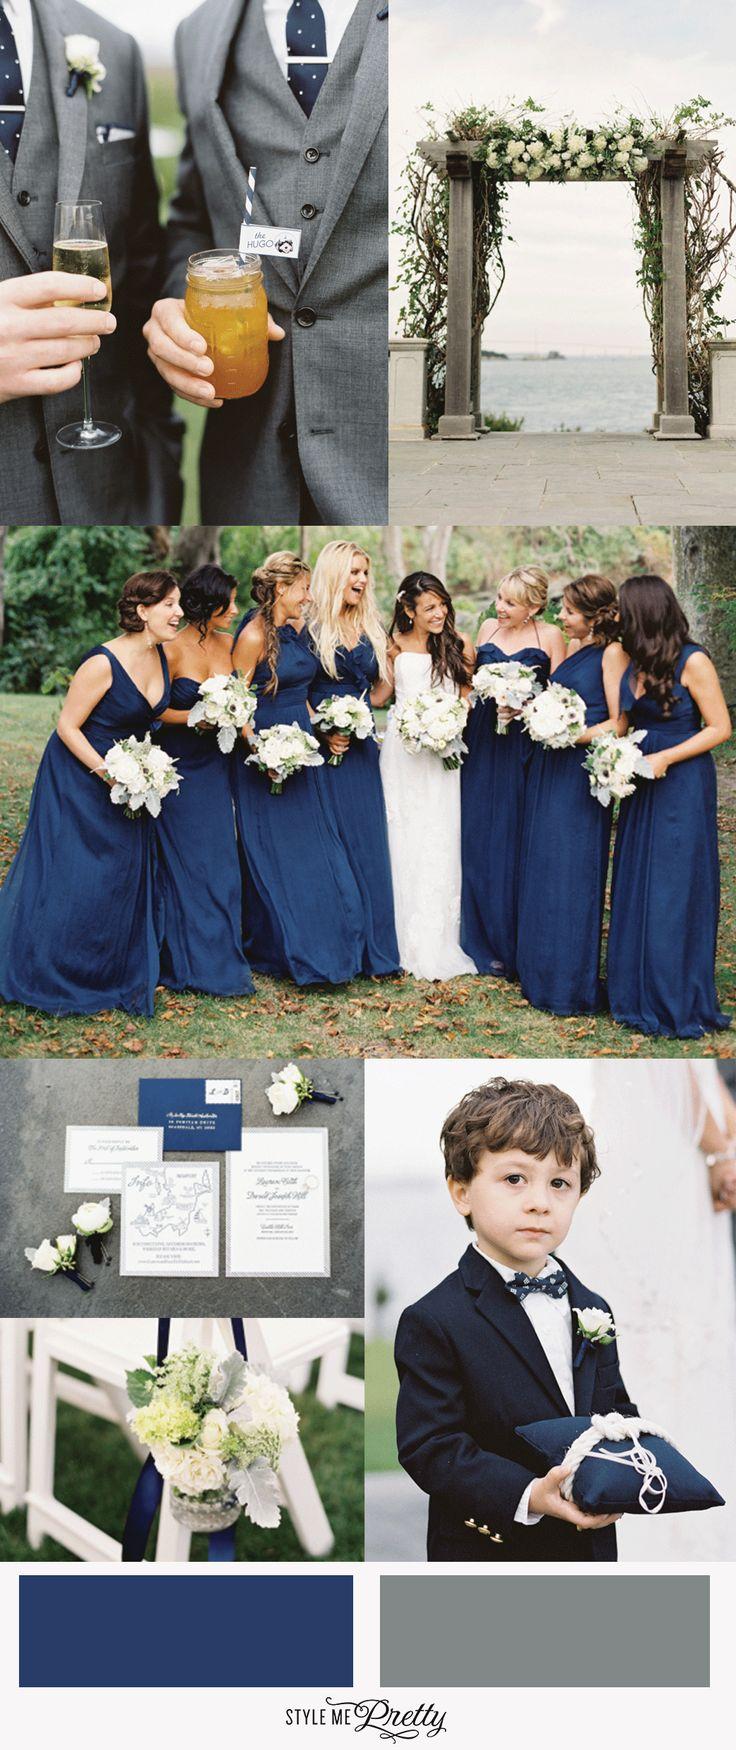 Navy and gray wedding details: http://www.stylemepretty.com/2015/03/03/modern-nautical-newport-wedding/